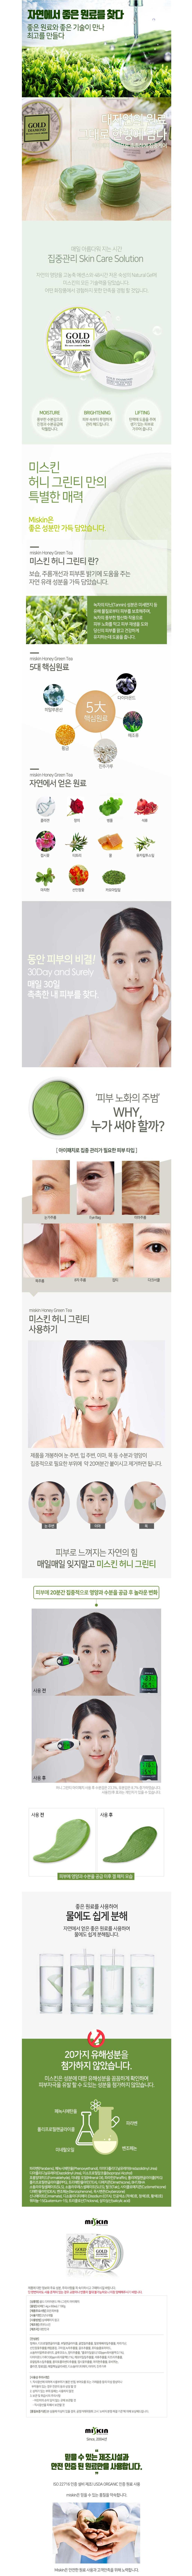 [Miskin] GOLD DIAMOND HONEY GREEN TEA HYDRO GEL EYE PATCH/ Korea Eye patch